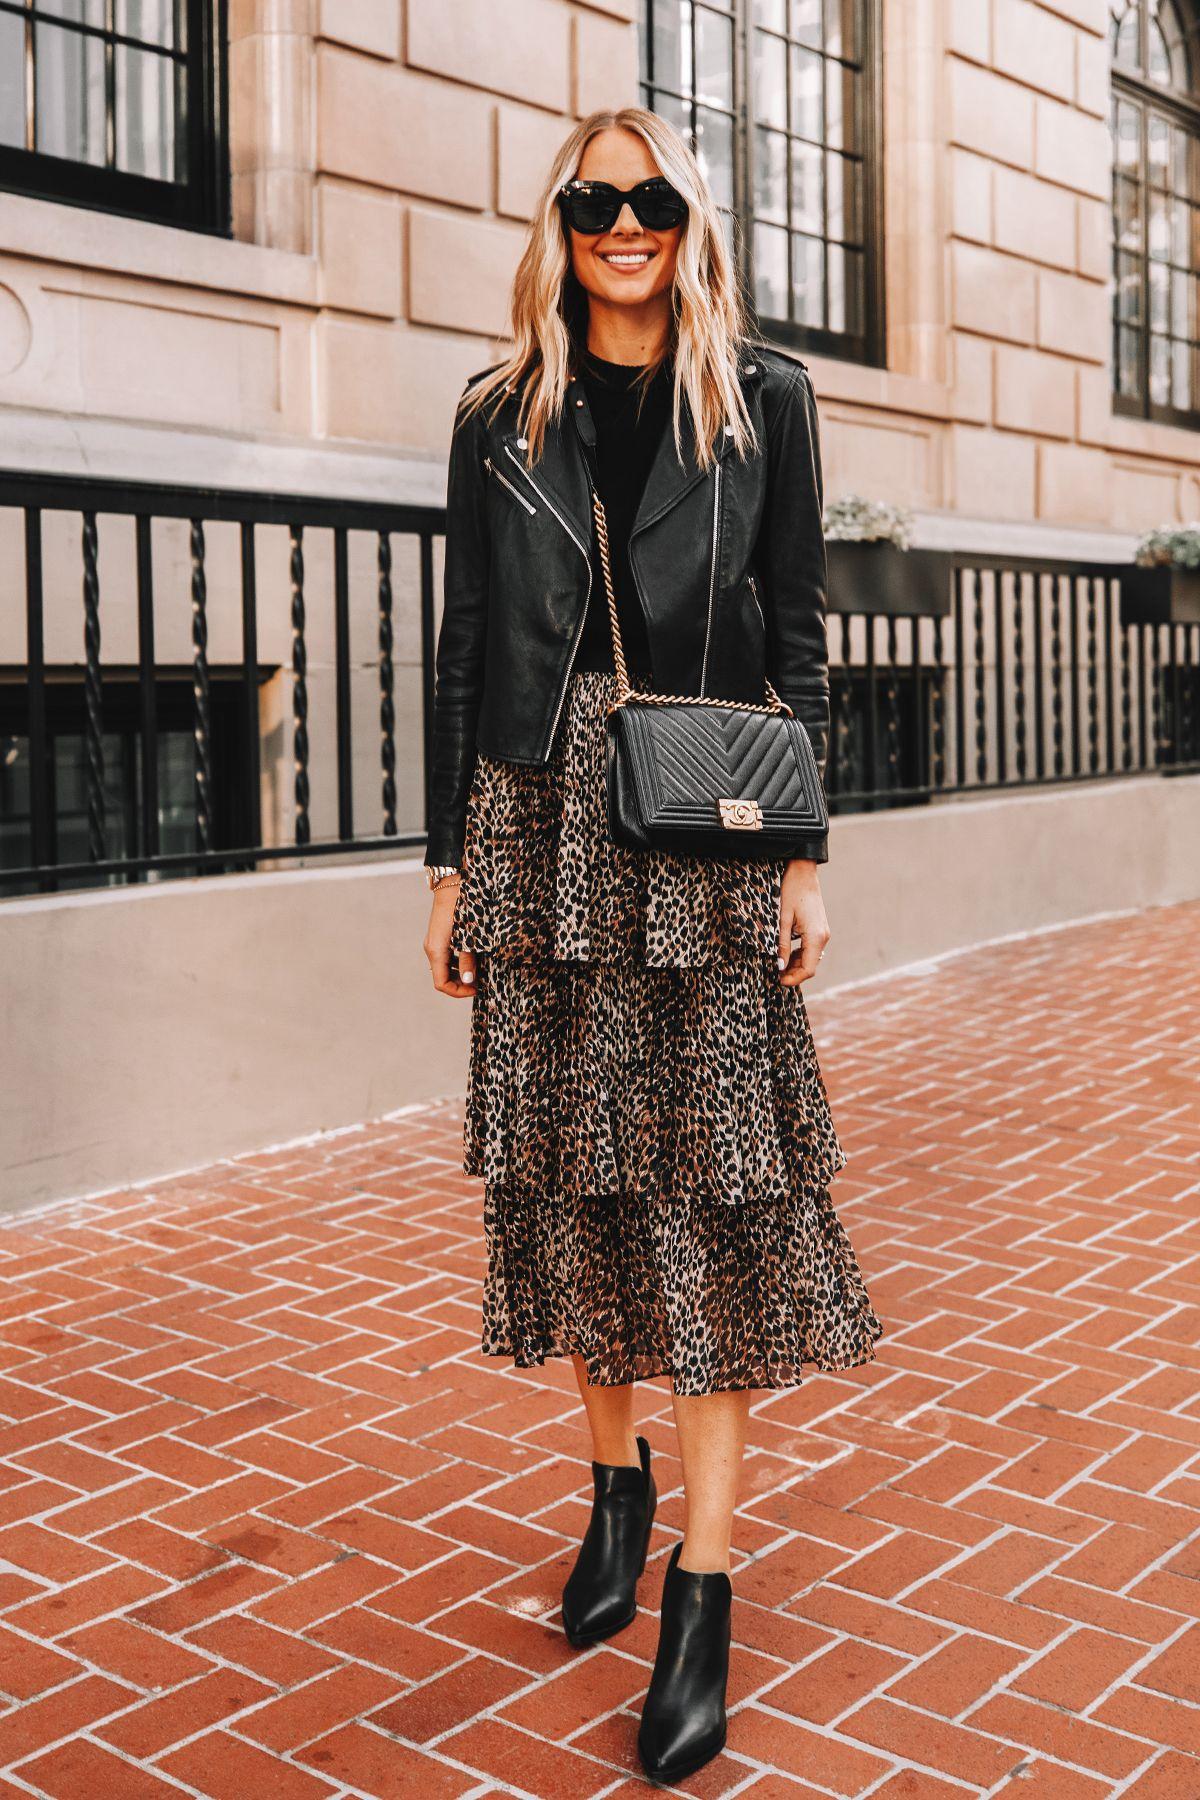 Fashion Jackson Wearing Black Leather Jacket Black Sweater Topshop Leopard Midi Skirt Black Bo Fashion Jackson Black Leather Jacket Outfit Leather Jacket Dress [ 1800 x 1200 Pixel ]